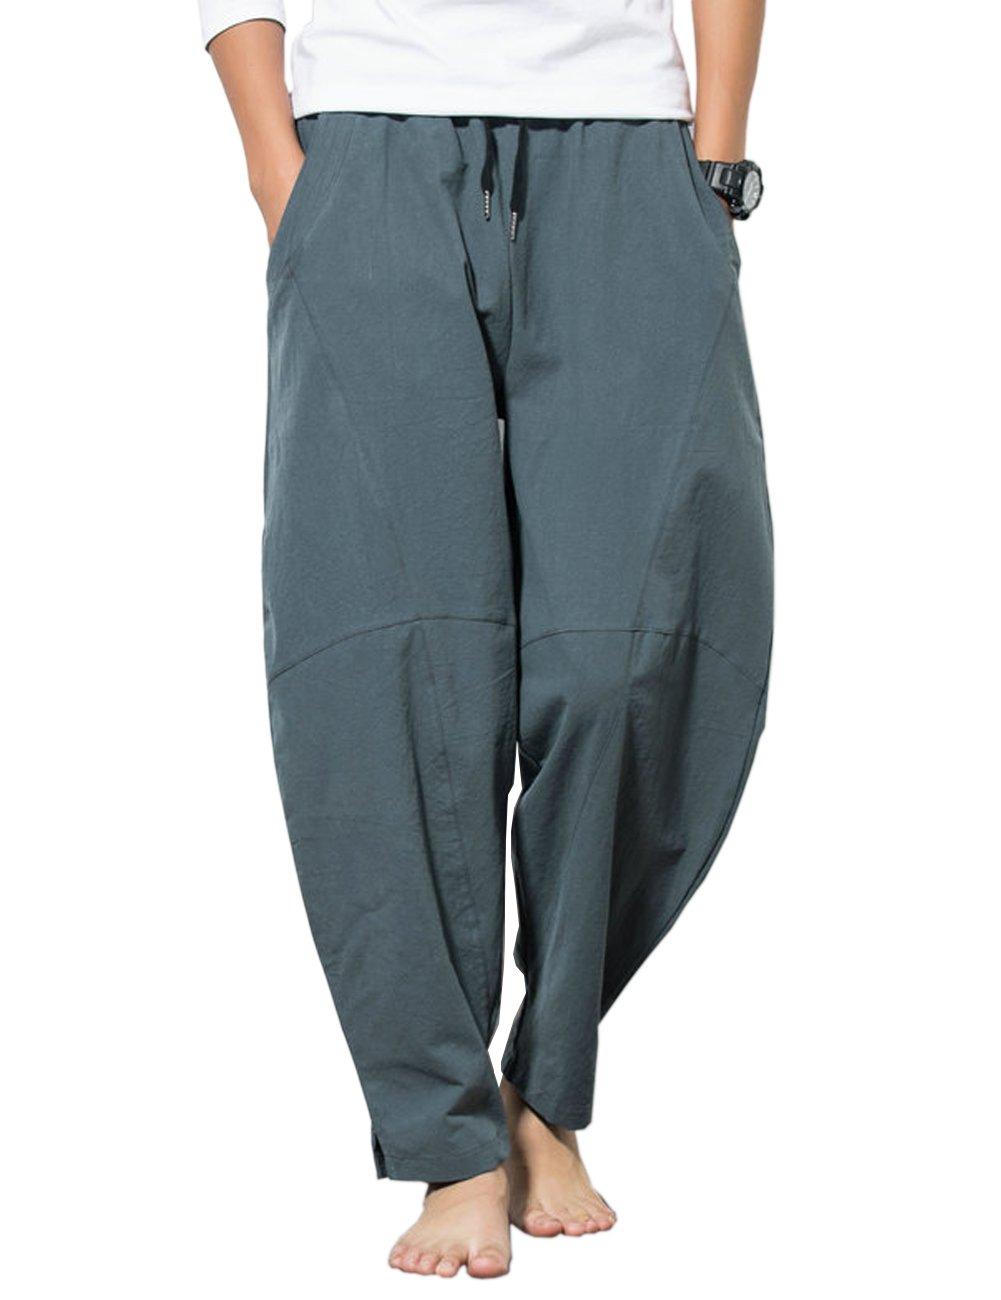 KAMUON Men's Summer Casual Baggy Drawstring Cotton Beach Harem Pants Trousers (US M/L = Asian Tag 3XL : Waist 35''-36'', Grey Blue)